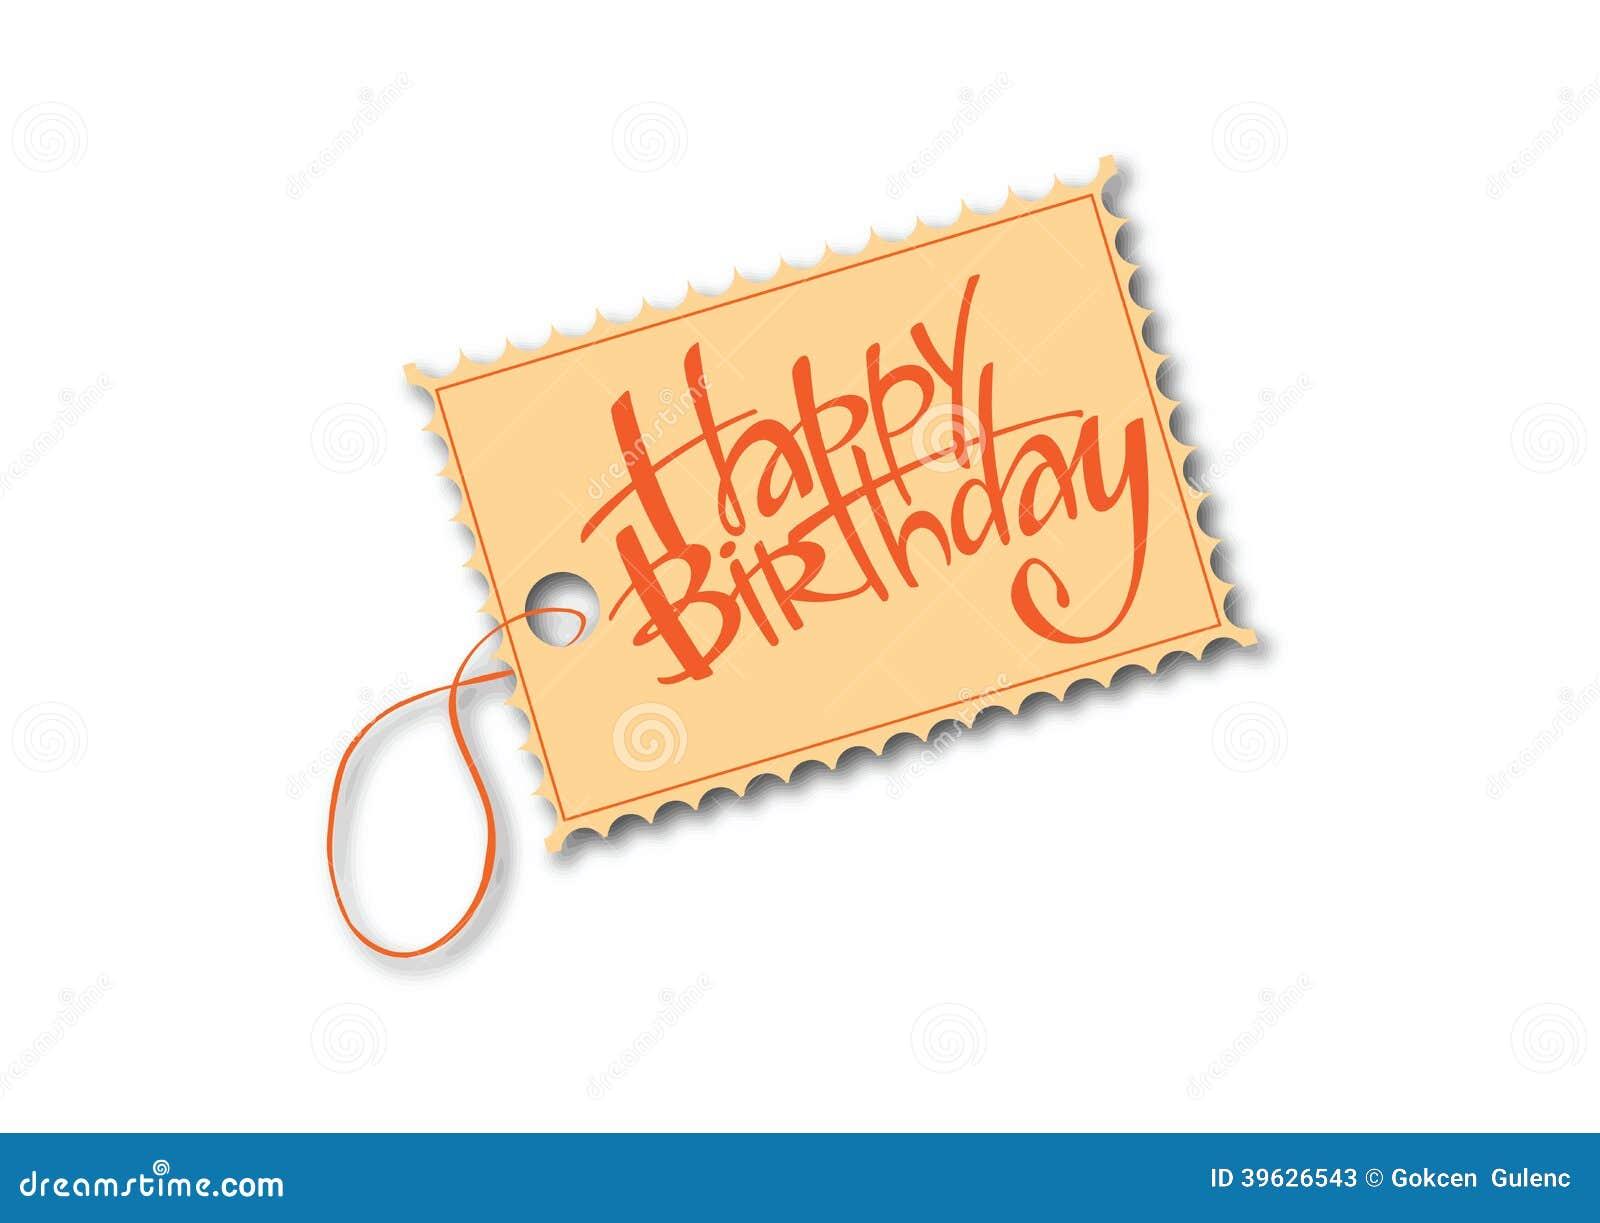 Happy Birthday Tag Stock Vector - Image: 39626543